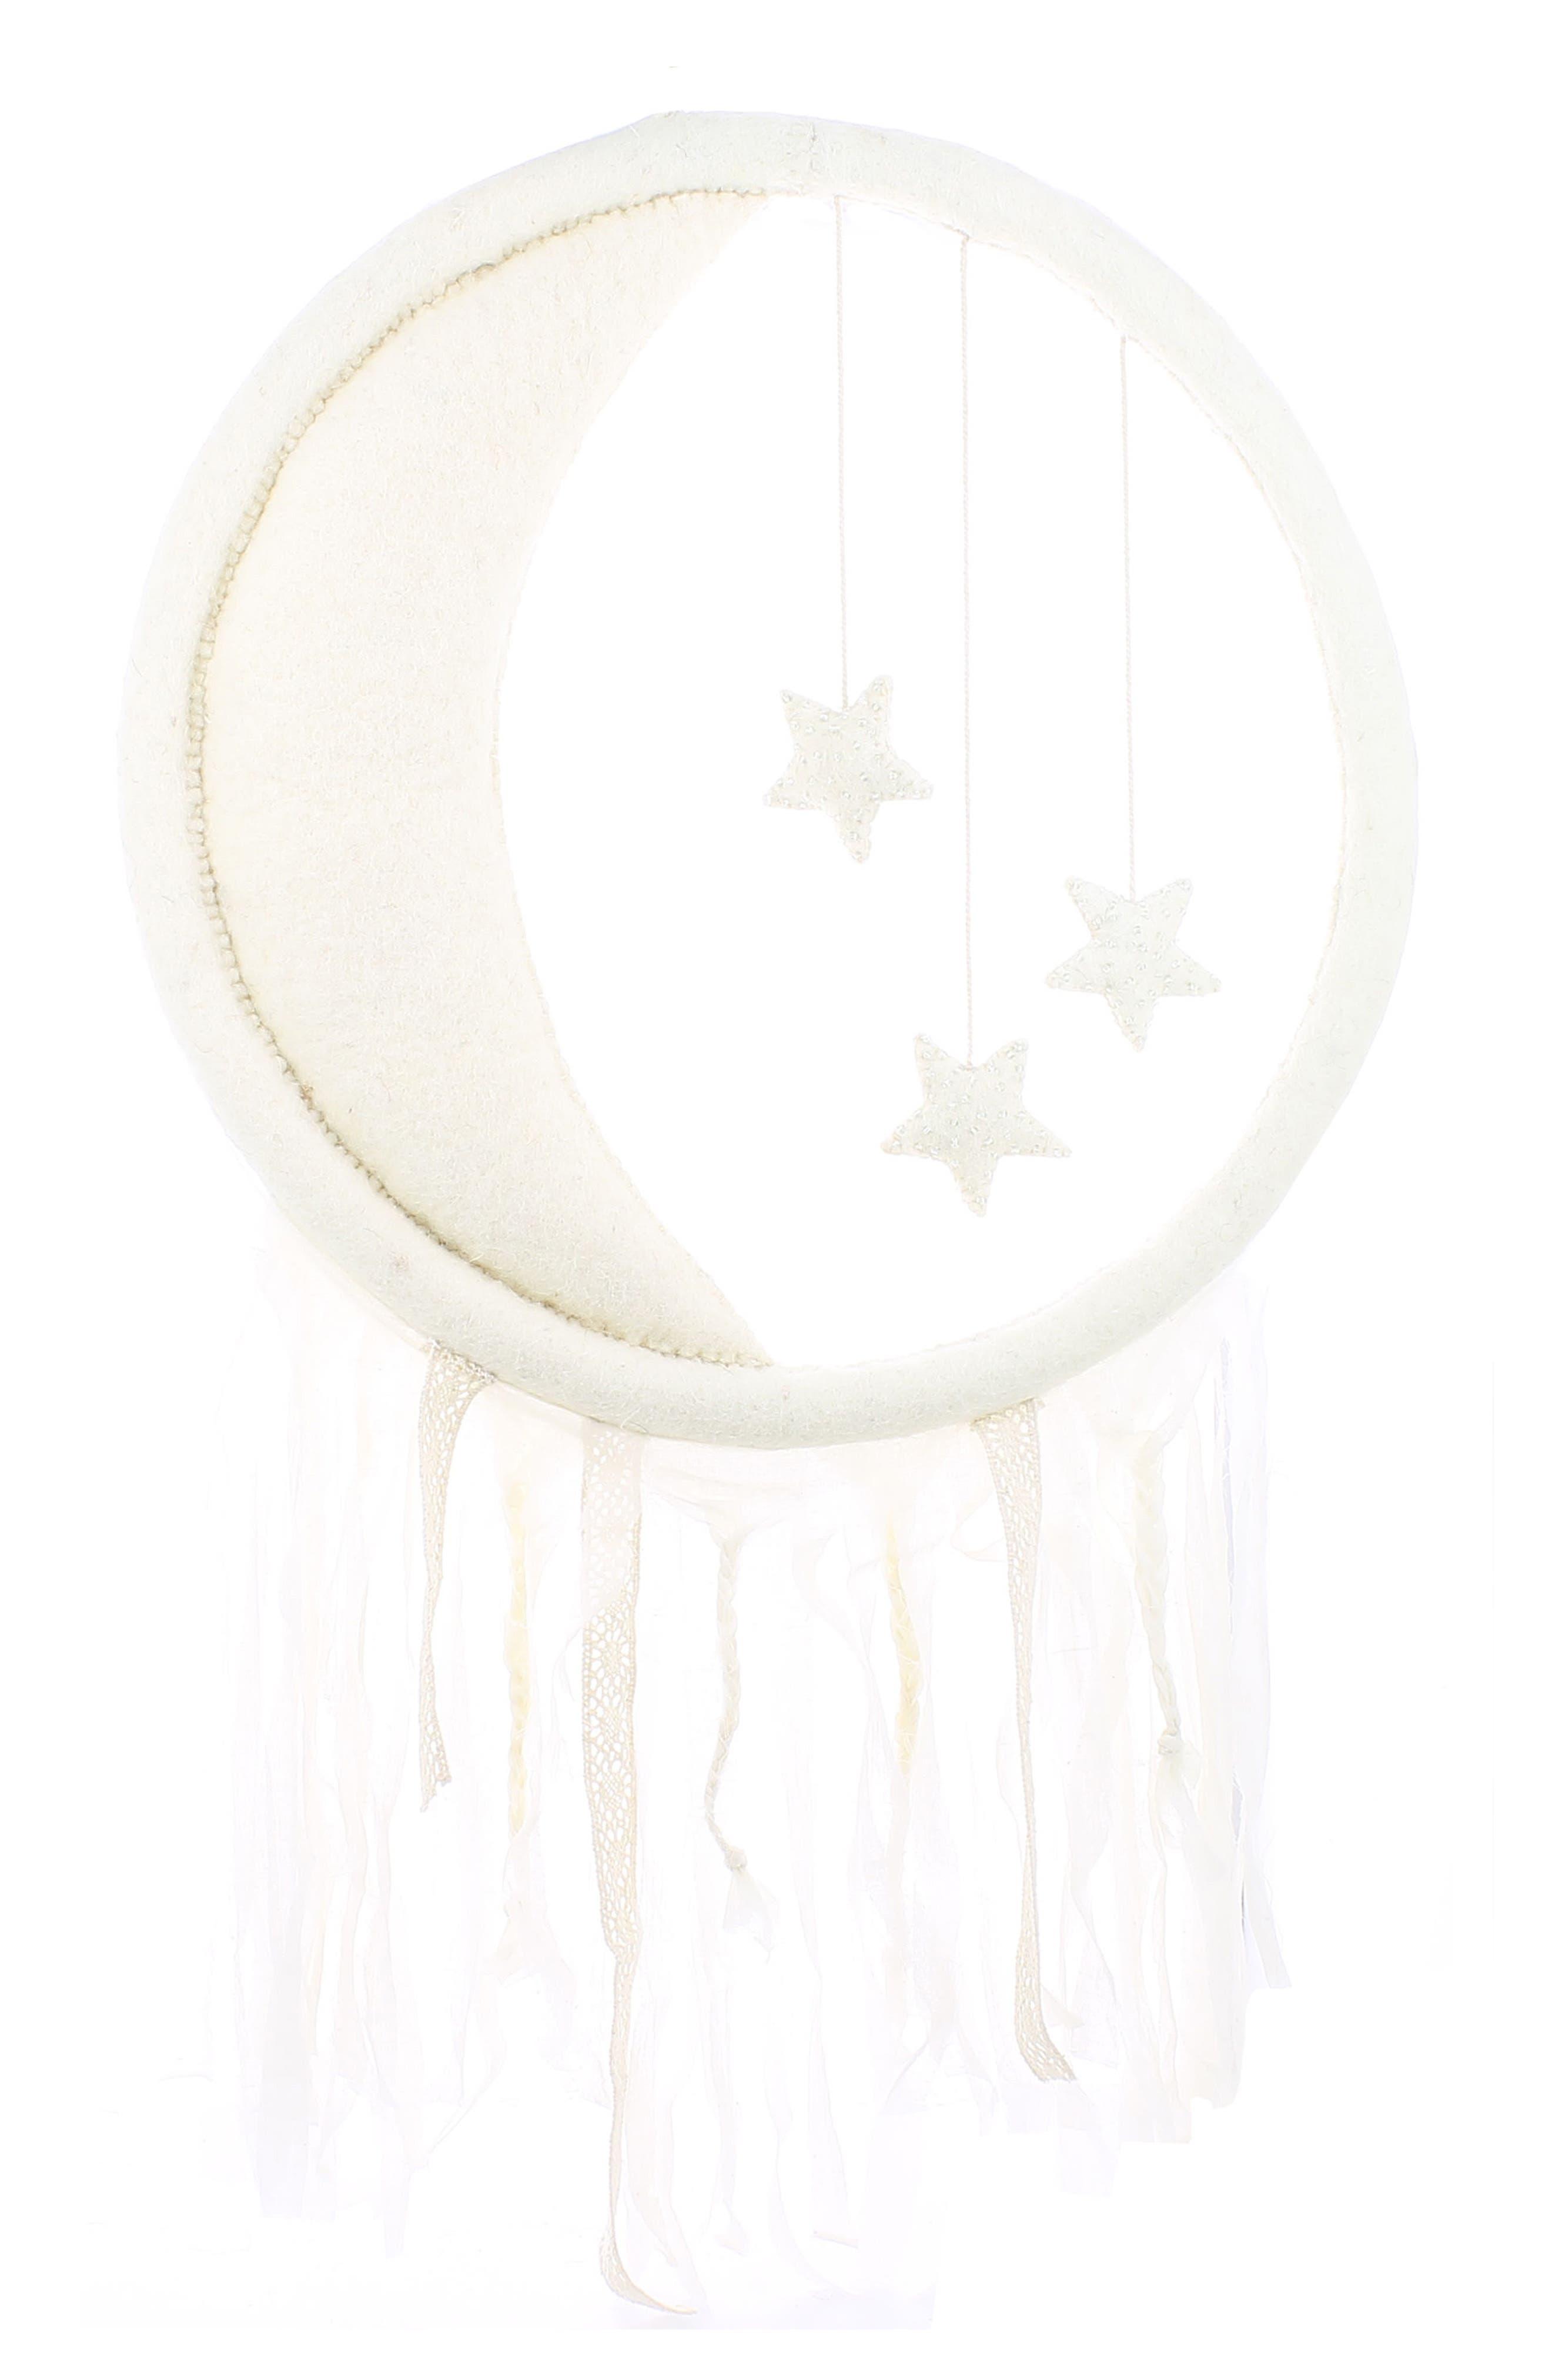 Crescent Moon & Beaded Star Wall Decoration,                             Main thumbnail 1, color,                             900